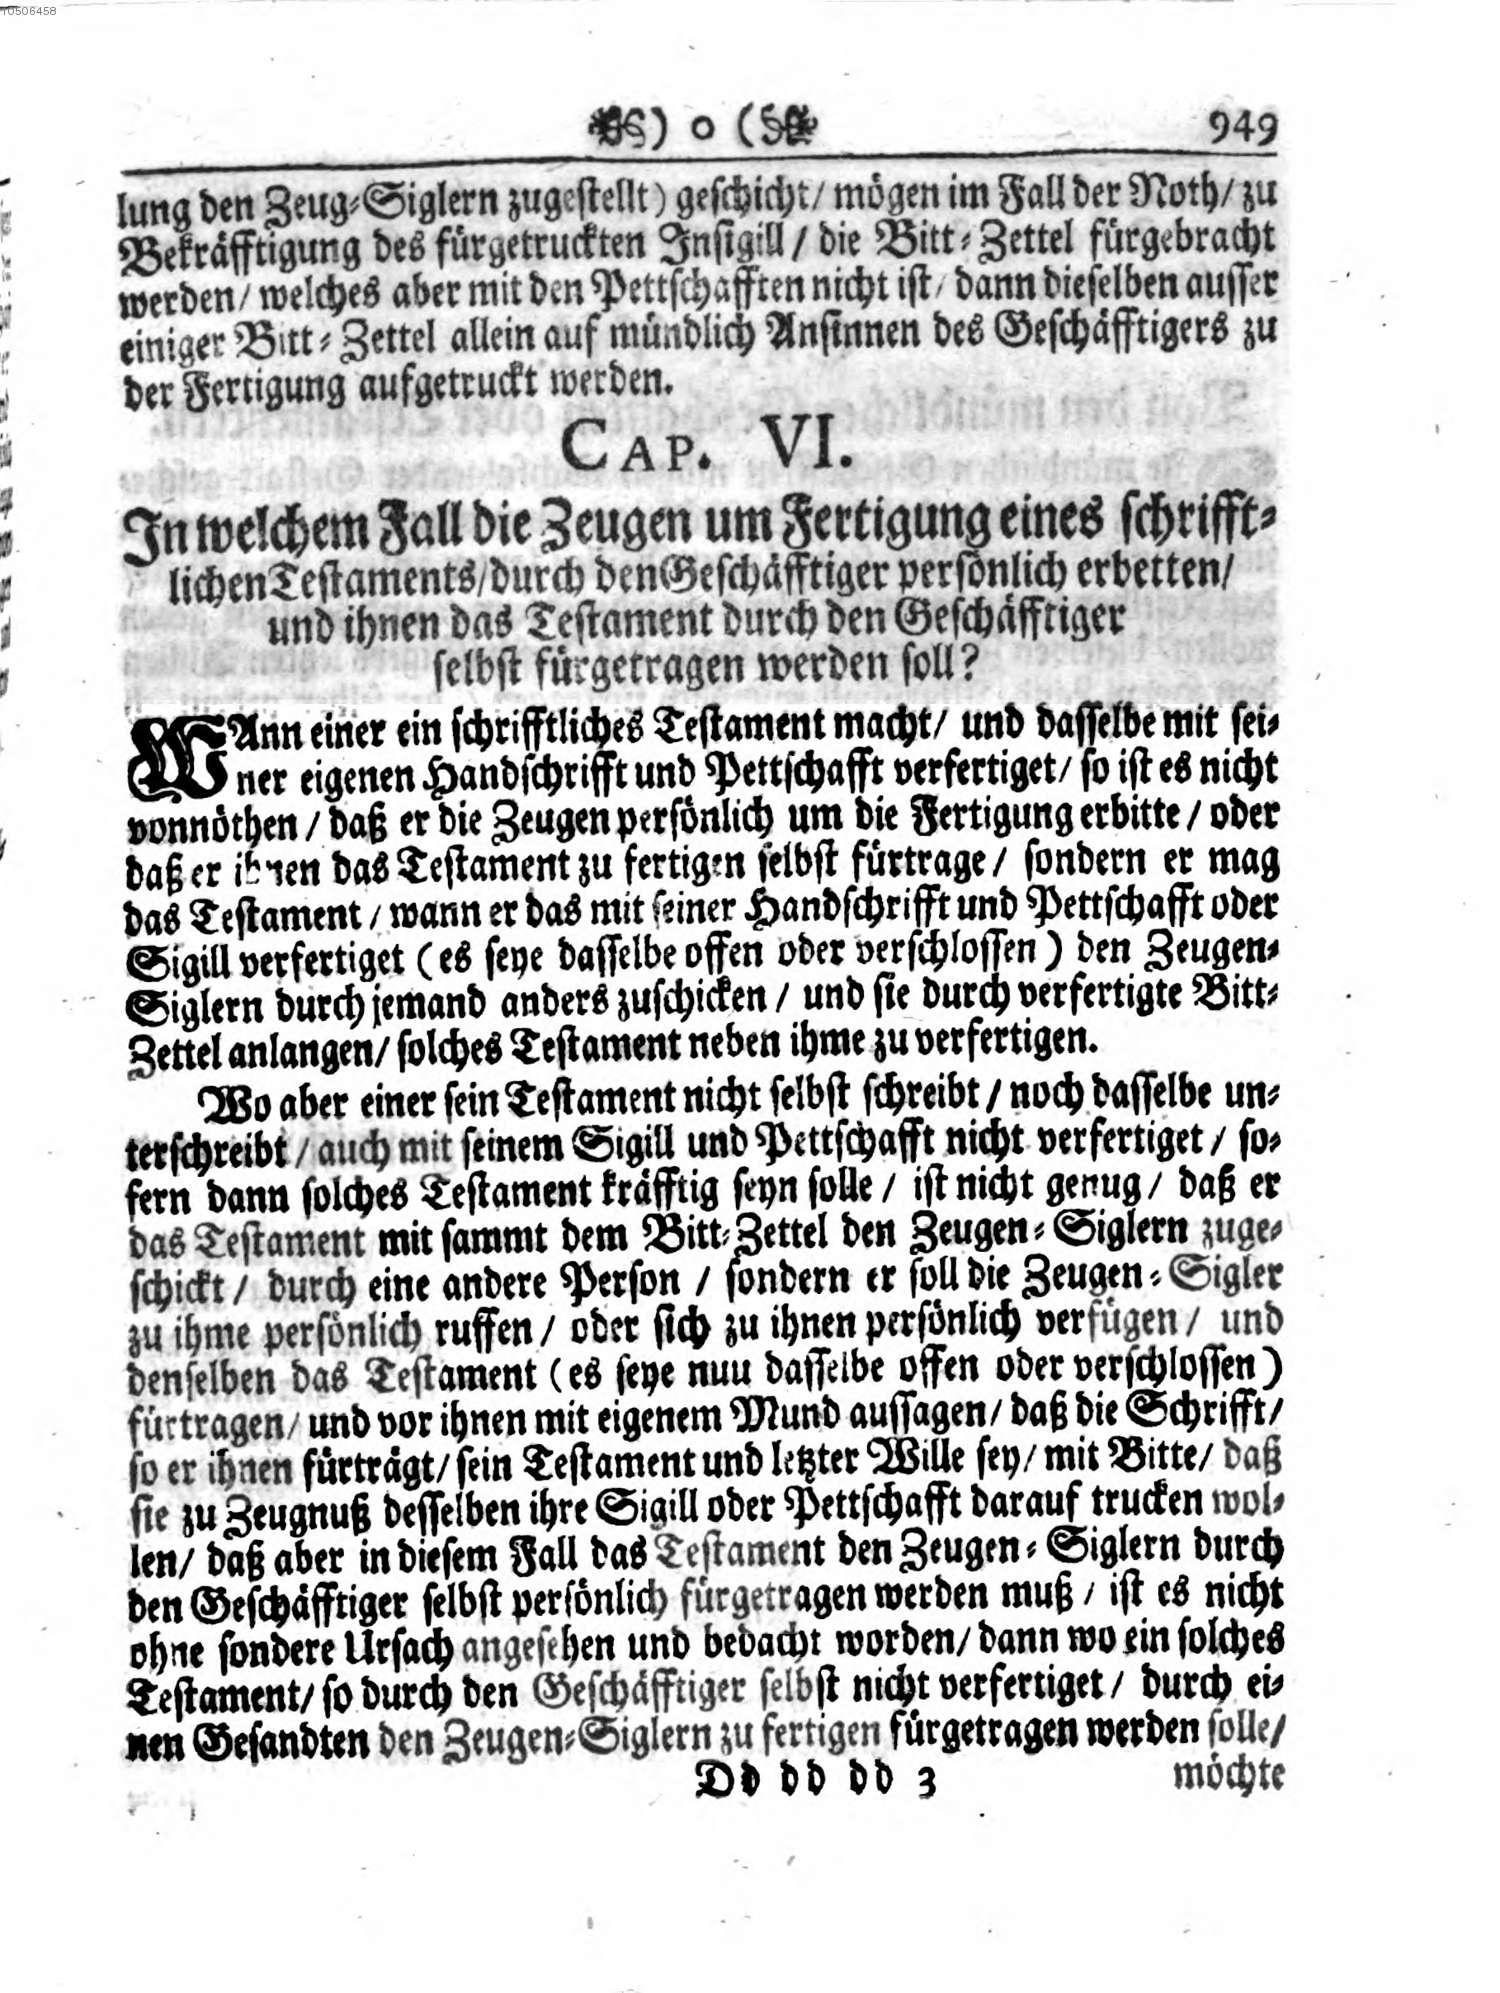 Bernhard Walther, Traktate (Suttinger 1718) - RepÖstRG